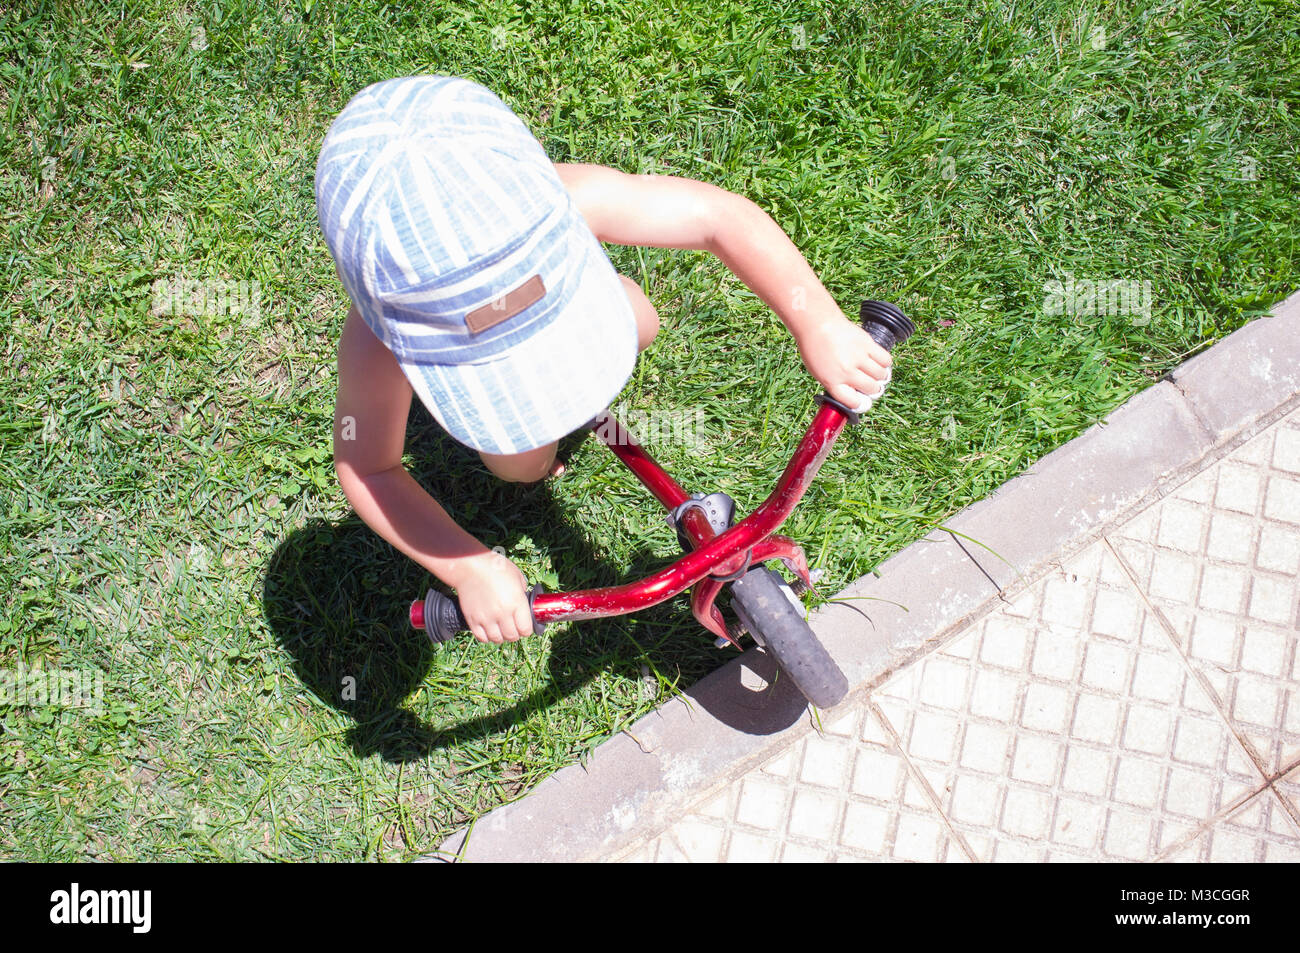 Boy in blue cap riding a blue balance bike (run bike). Happy child learning to keep balance in the garden - Stock Image